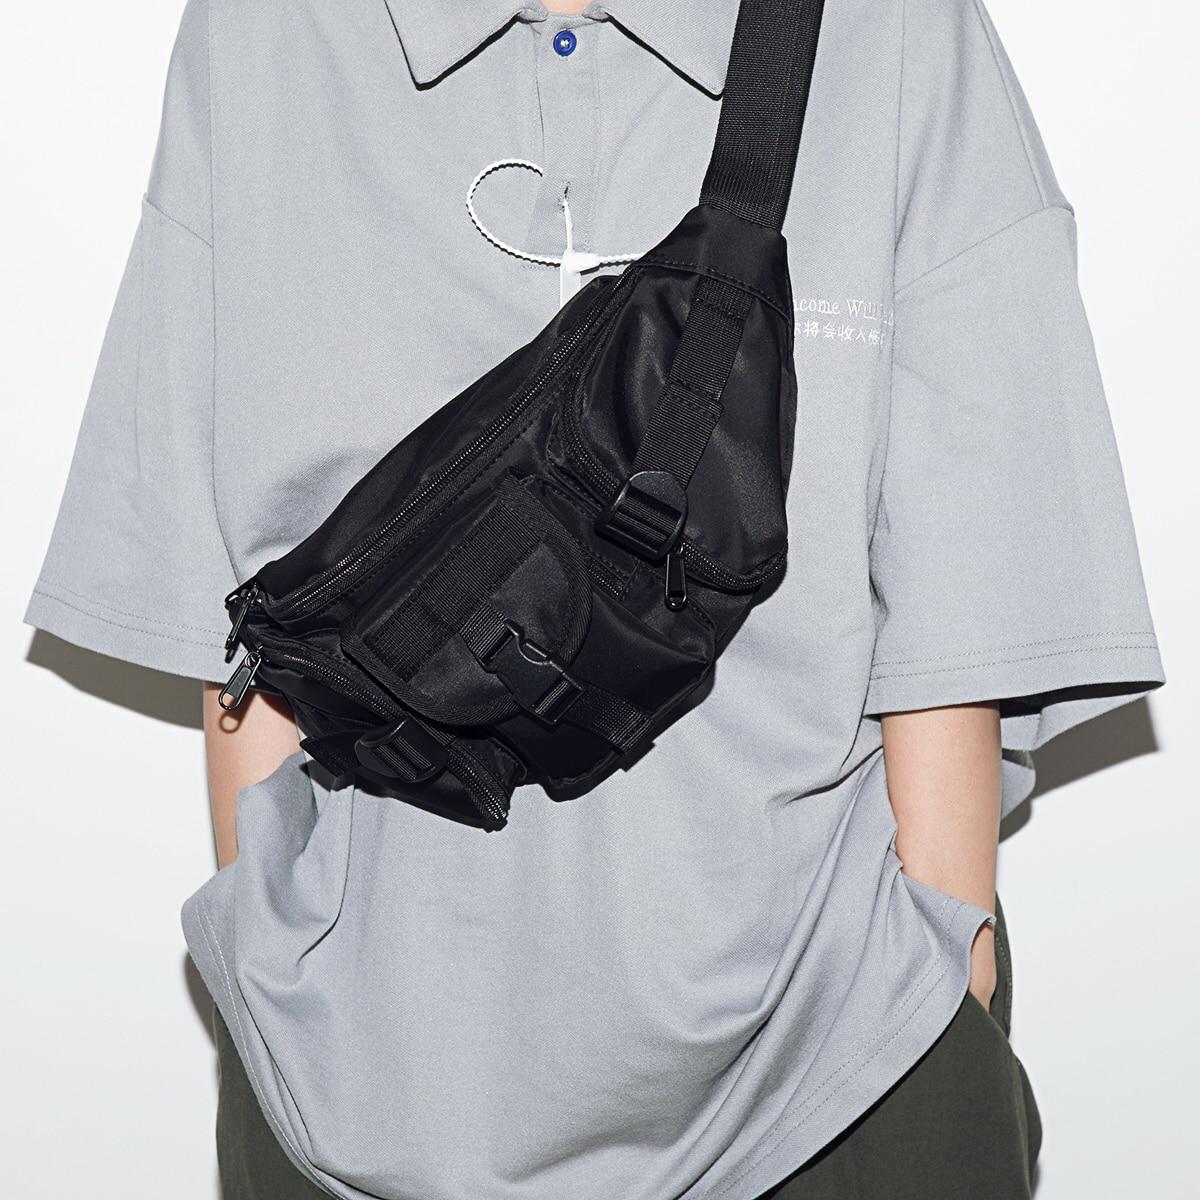 019 Men Street Multifunction Chest Bag High Quality Tactical Chest Packs Short Trip Messengers Bag Water Repellent Shoulder Bag